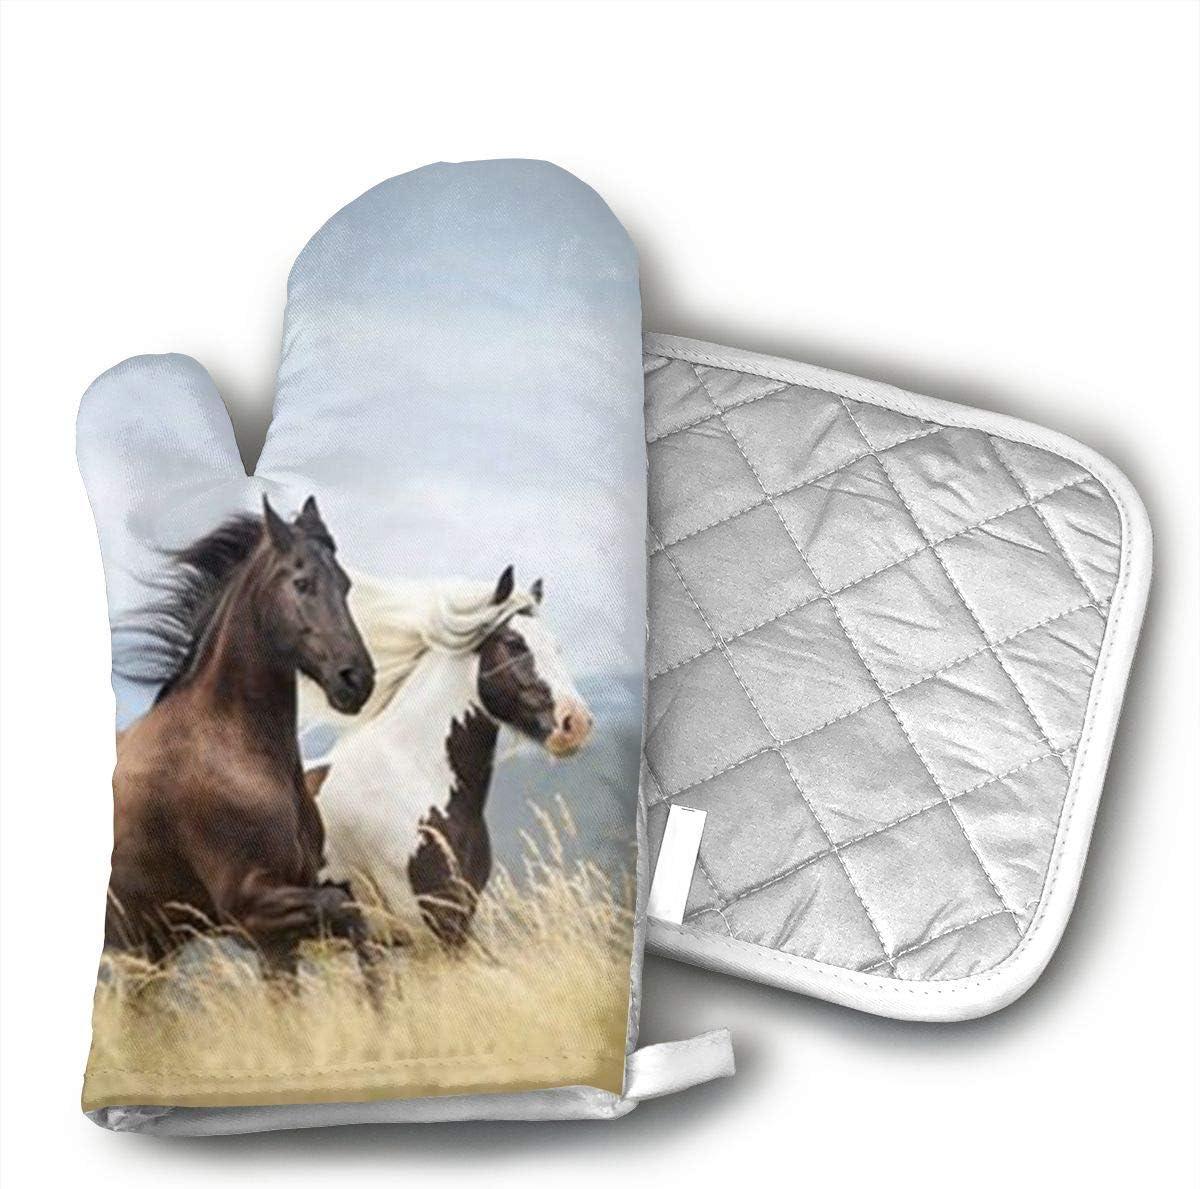 GNKJTYSK Horses Running Art Print Heat-Resistant Polyester Cotton, Nylon Gloves and Pot Holder for Kitchen, Non-Slip Sleeve, 2 Sets Each, Oven Gloves for Barbecue Cooking